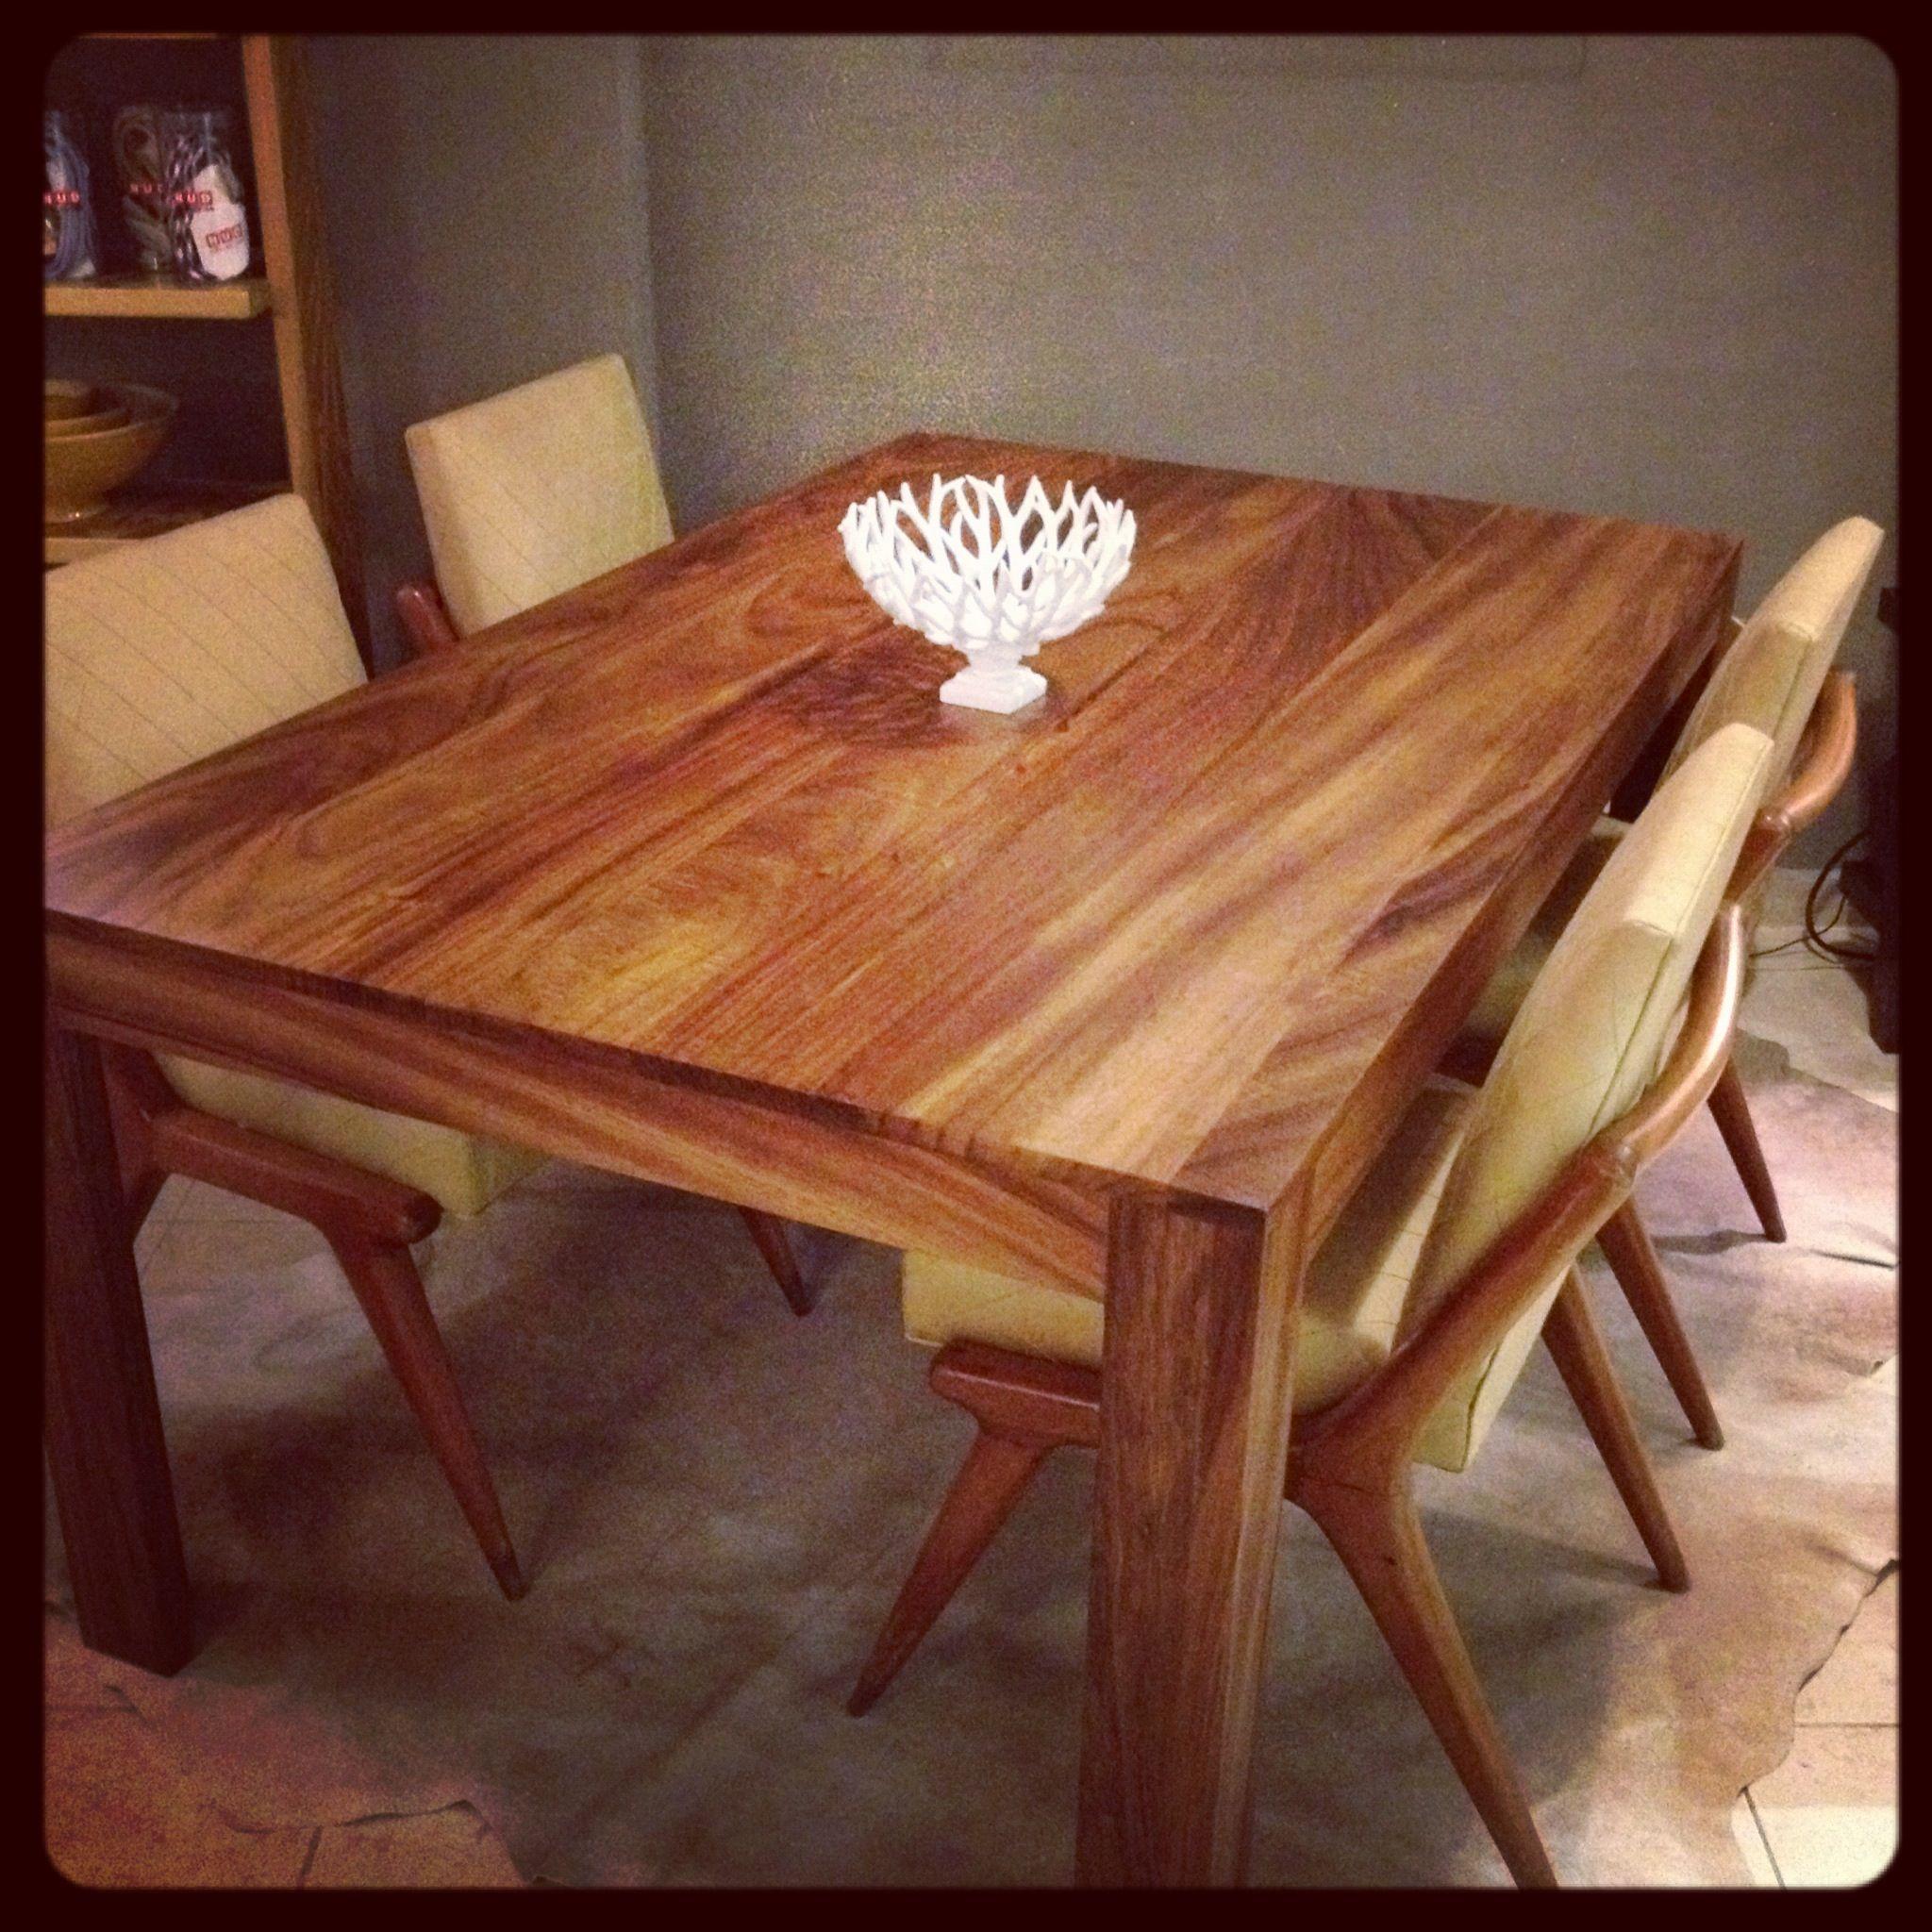 Parota dining table wirh vintage chairs bobo design and for Comedores para el hogar